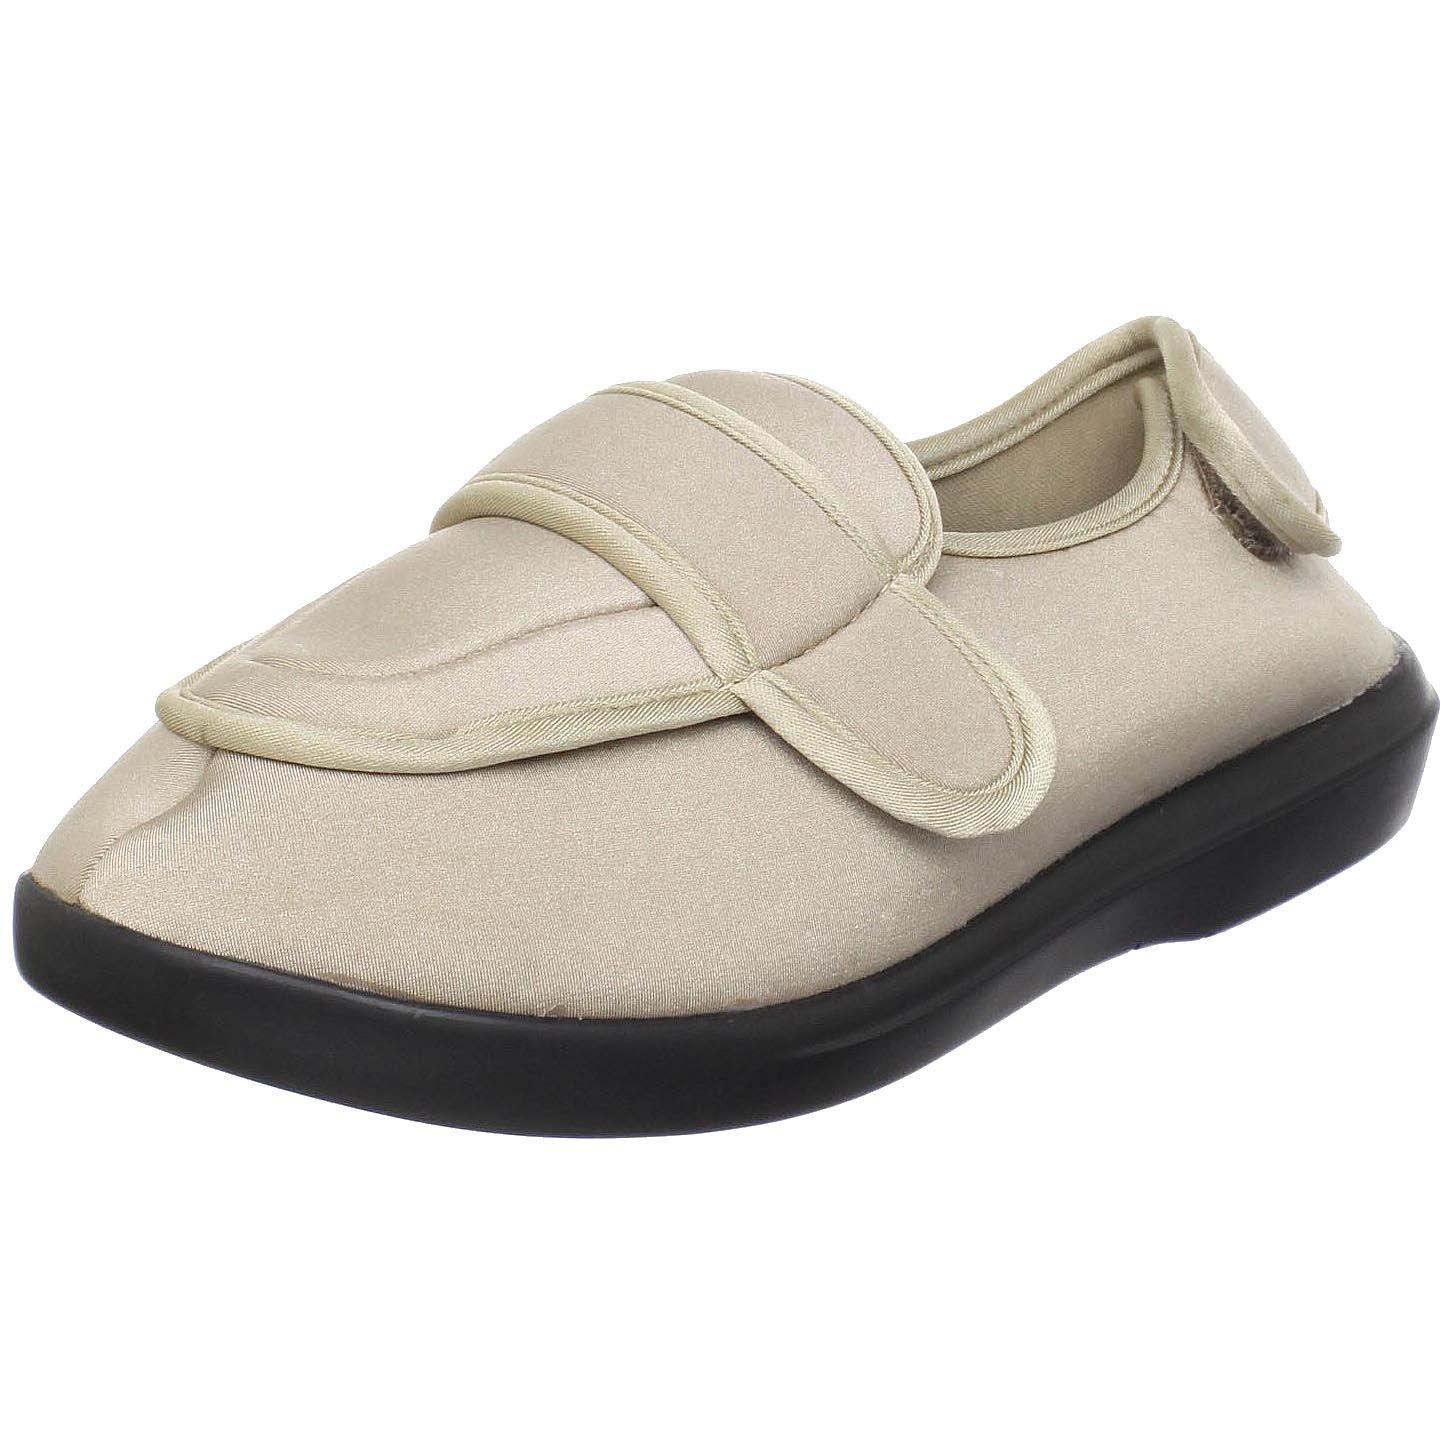 Propet Women's Cronus Comfort Sneaker B003CBZWNE 8.5 B(M) US|Sand